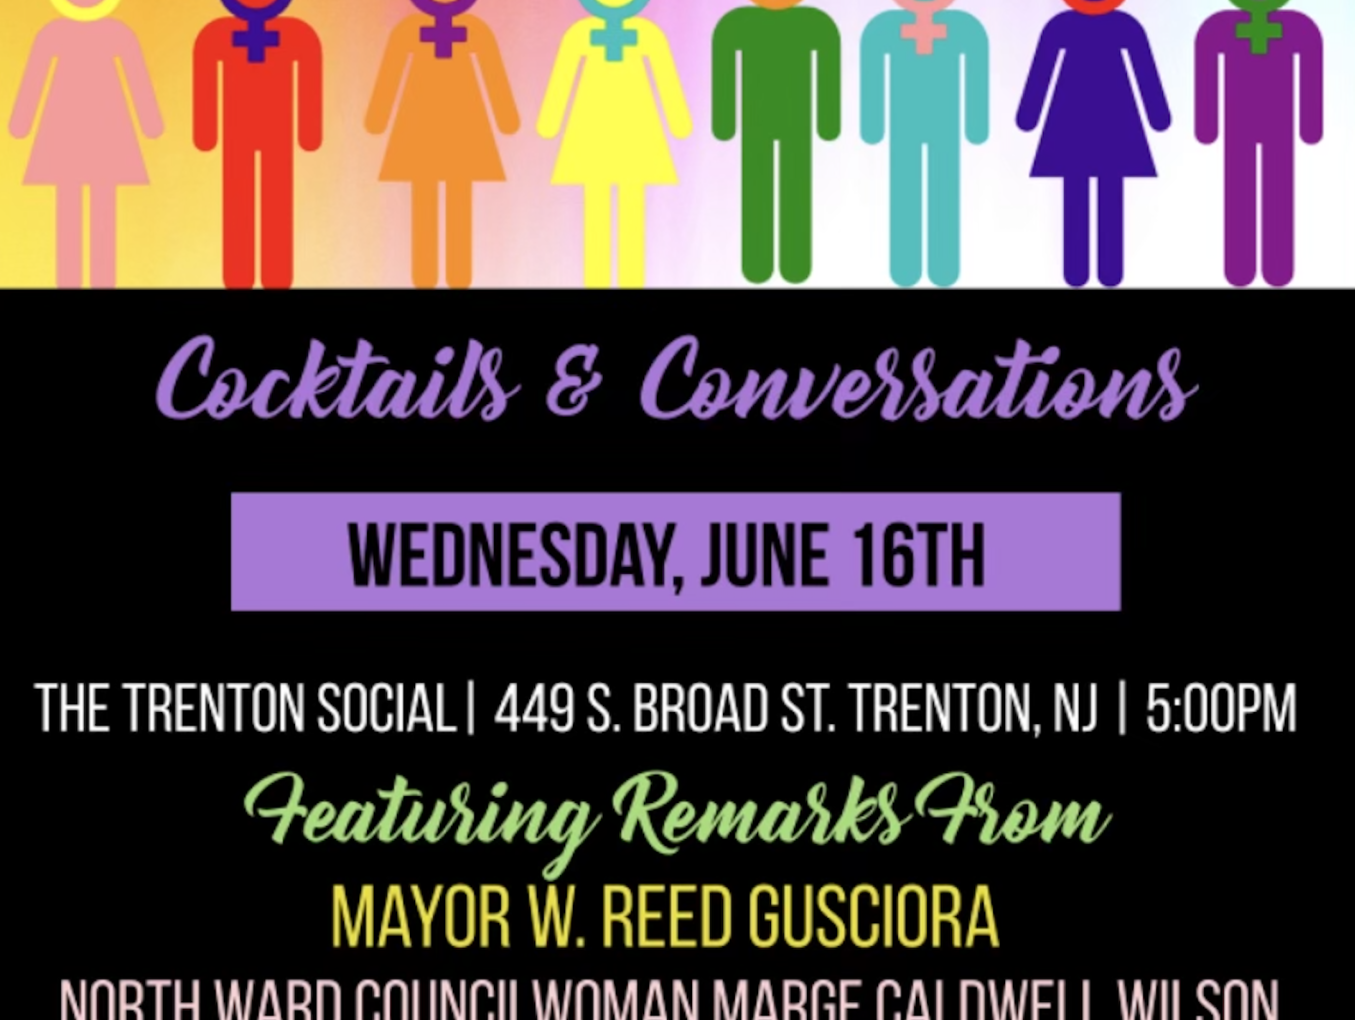 Cocktails & Conversation: Capital City LGBTQ Happy Hour